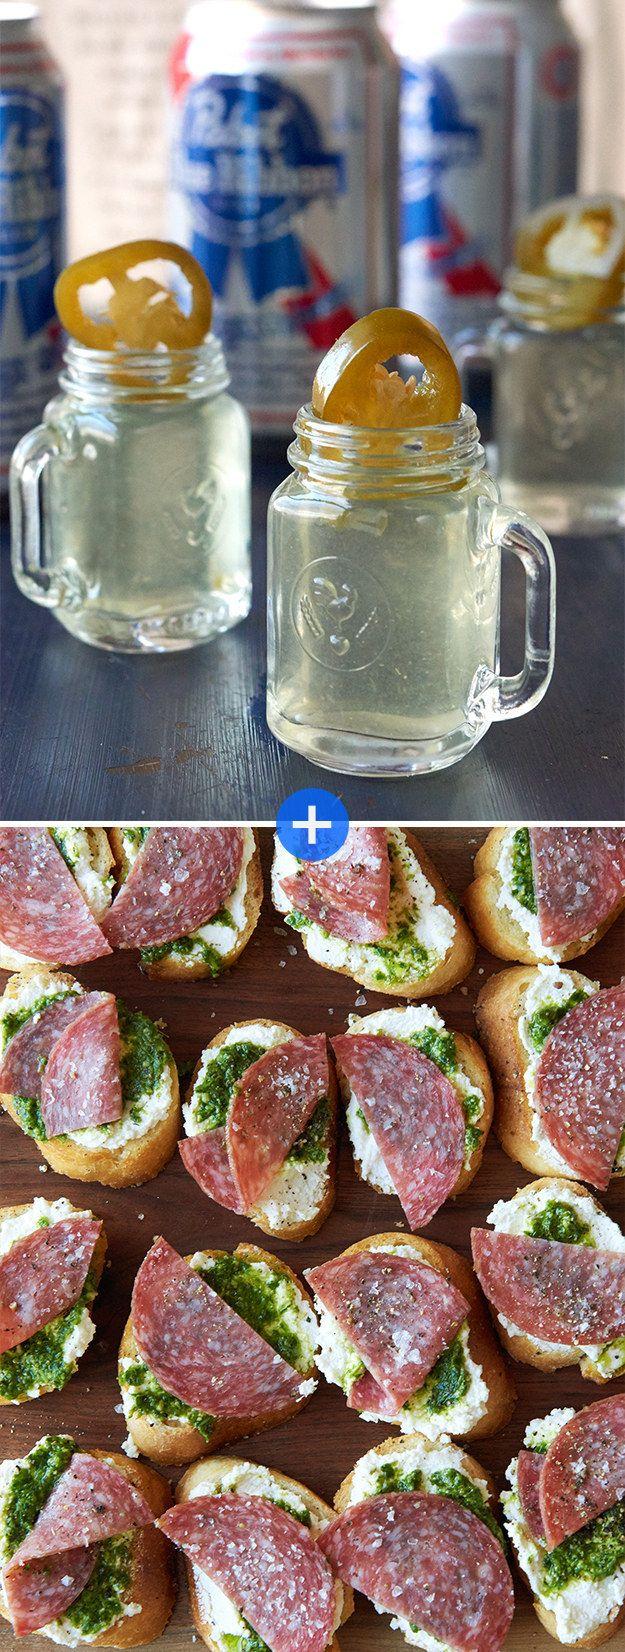 Salami Toasts + Jalapeño Picklebacks = yes plz thanks